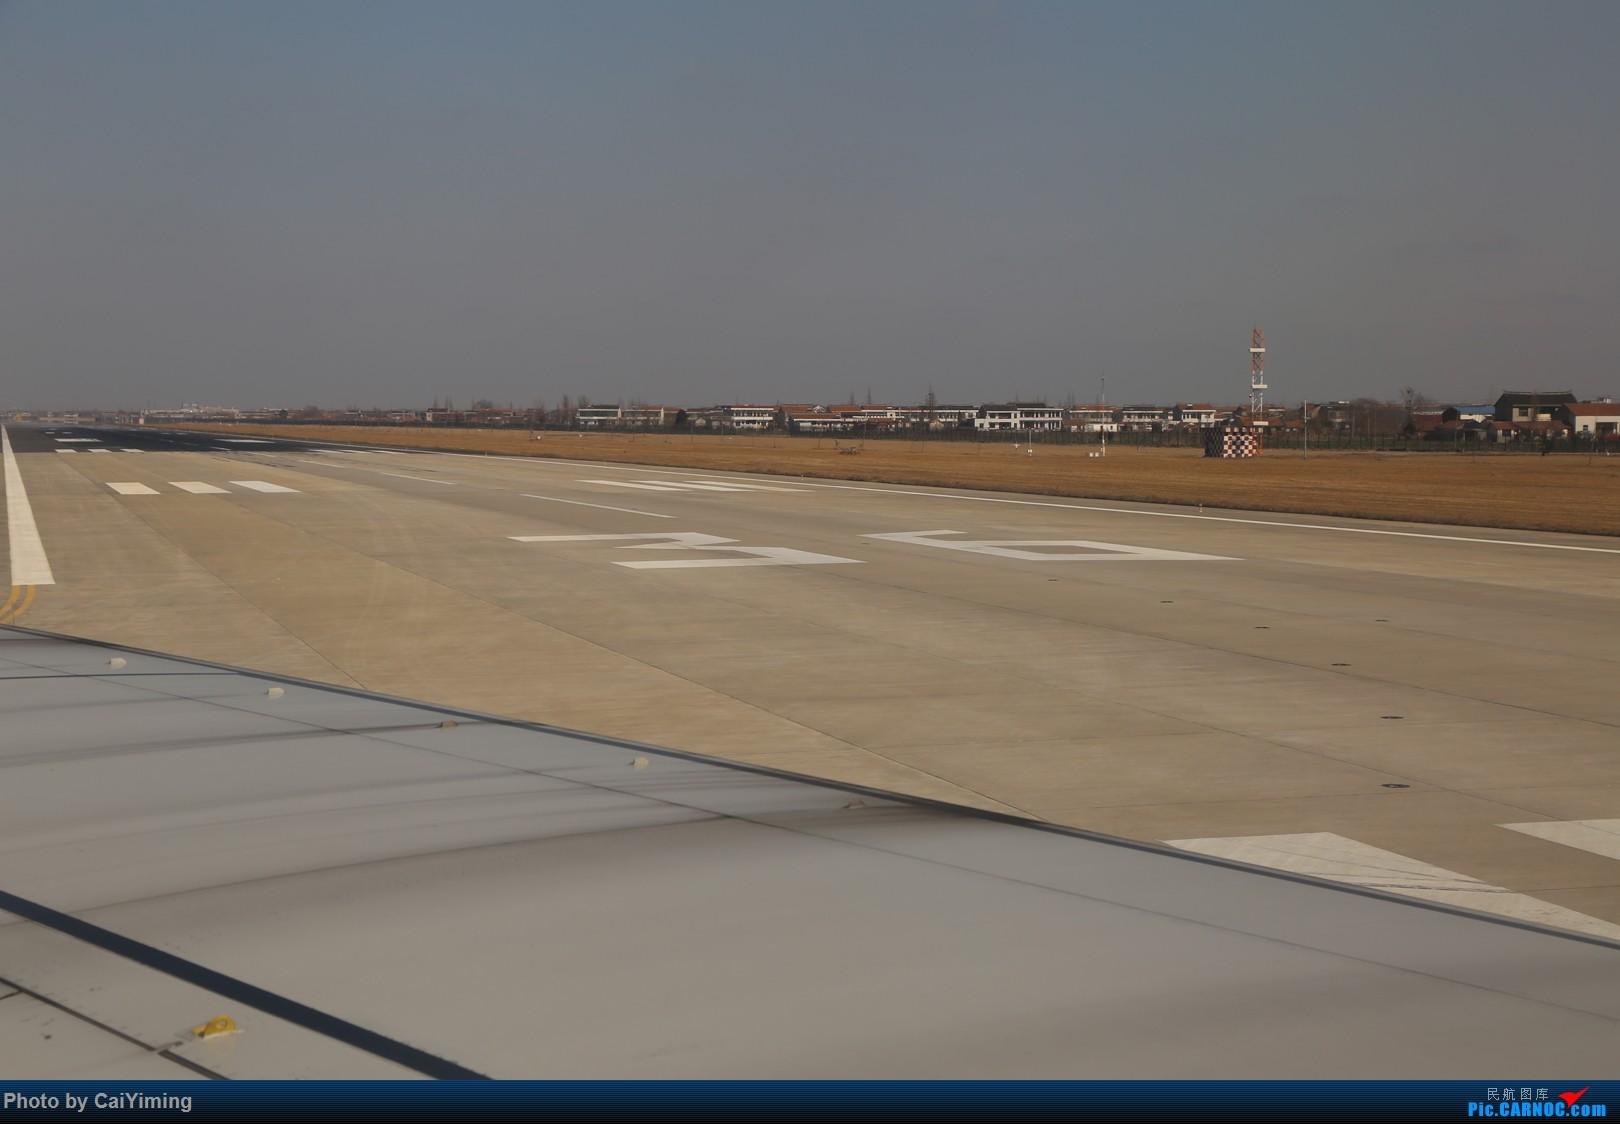 Re:[原创]白云之城——广州行记(南通兴东ZSNT/NTG—广州白云ZGGG/CAN—上海虹桥ZSSS/SHA) BOEING 737-800 B-5413 中国南通兴东机场 中国南通兴东机场